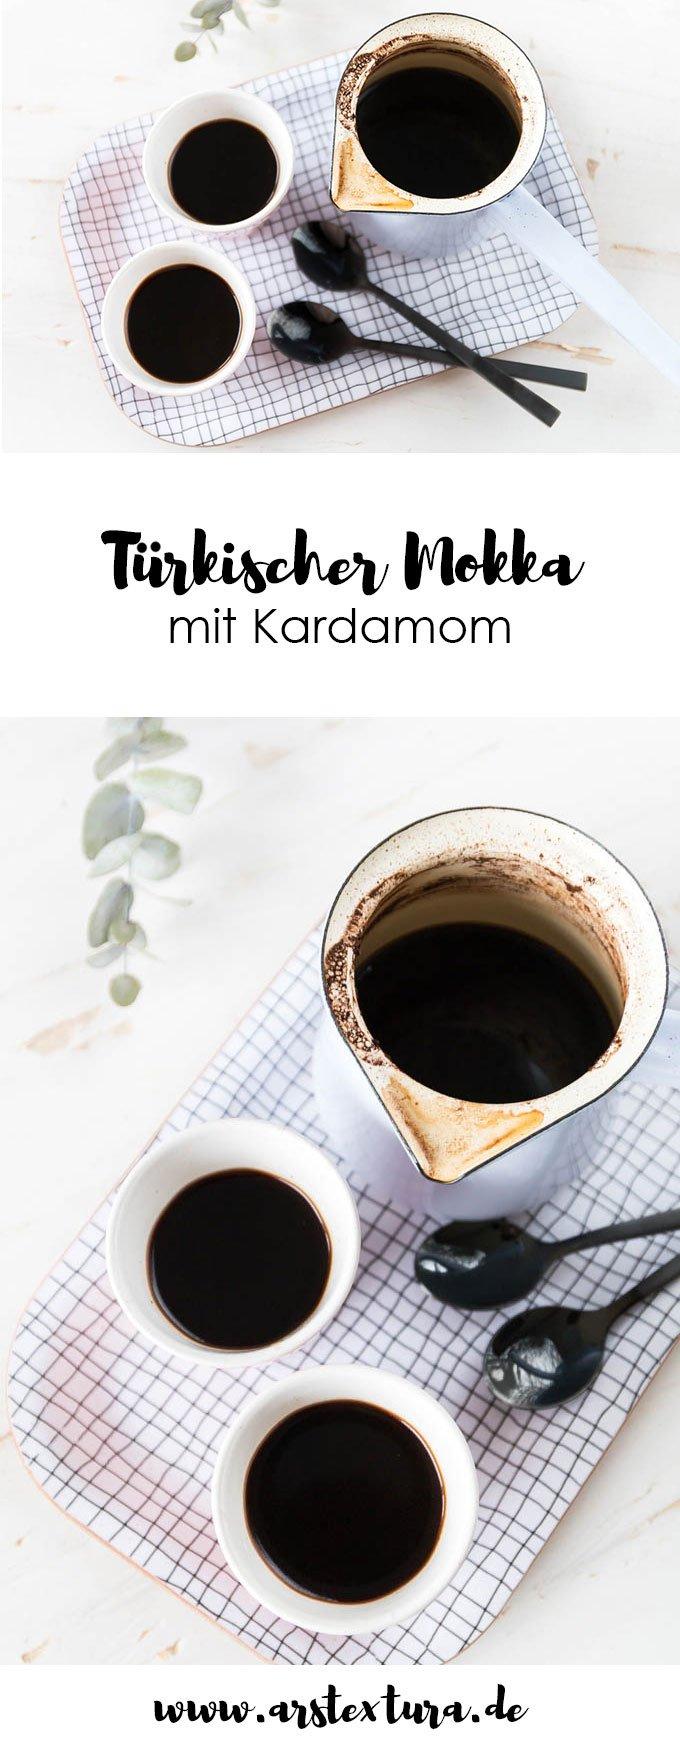 Türkischer Kardamom Mokka - Rezept - so gelingt dir der perfekte Mokka